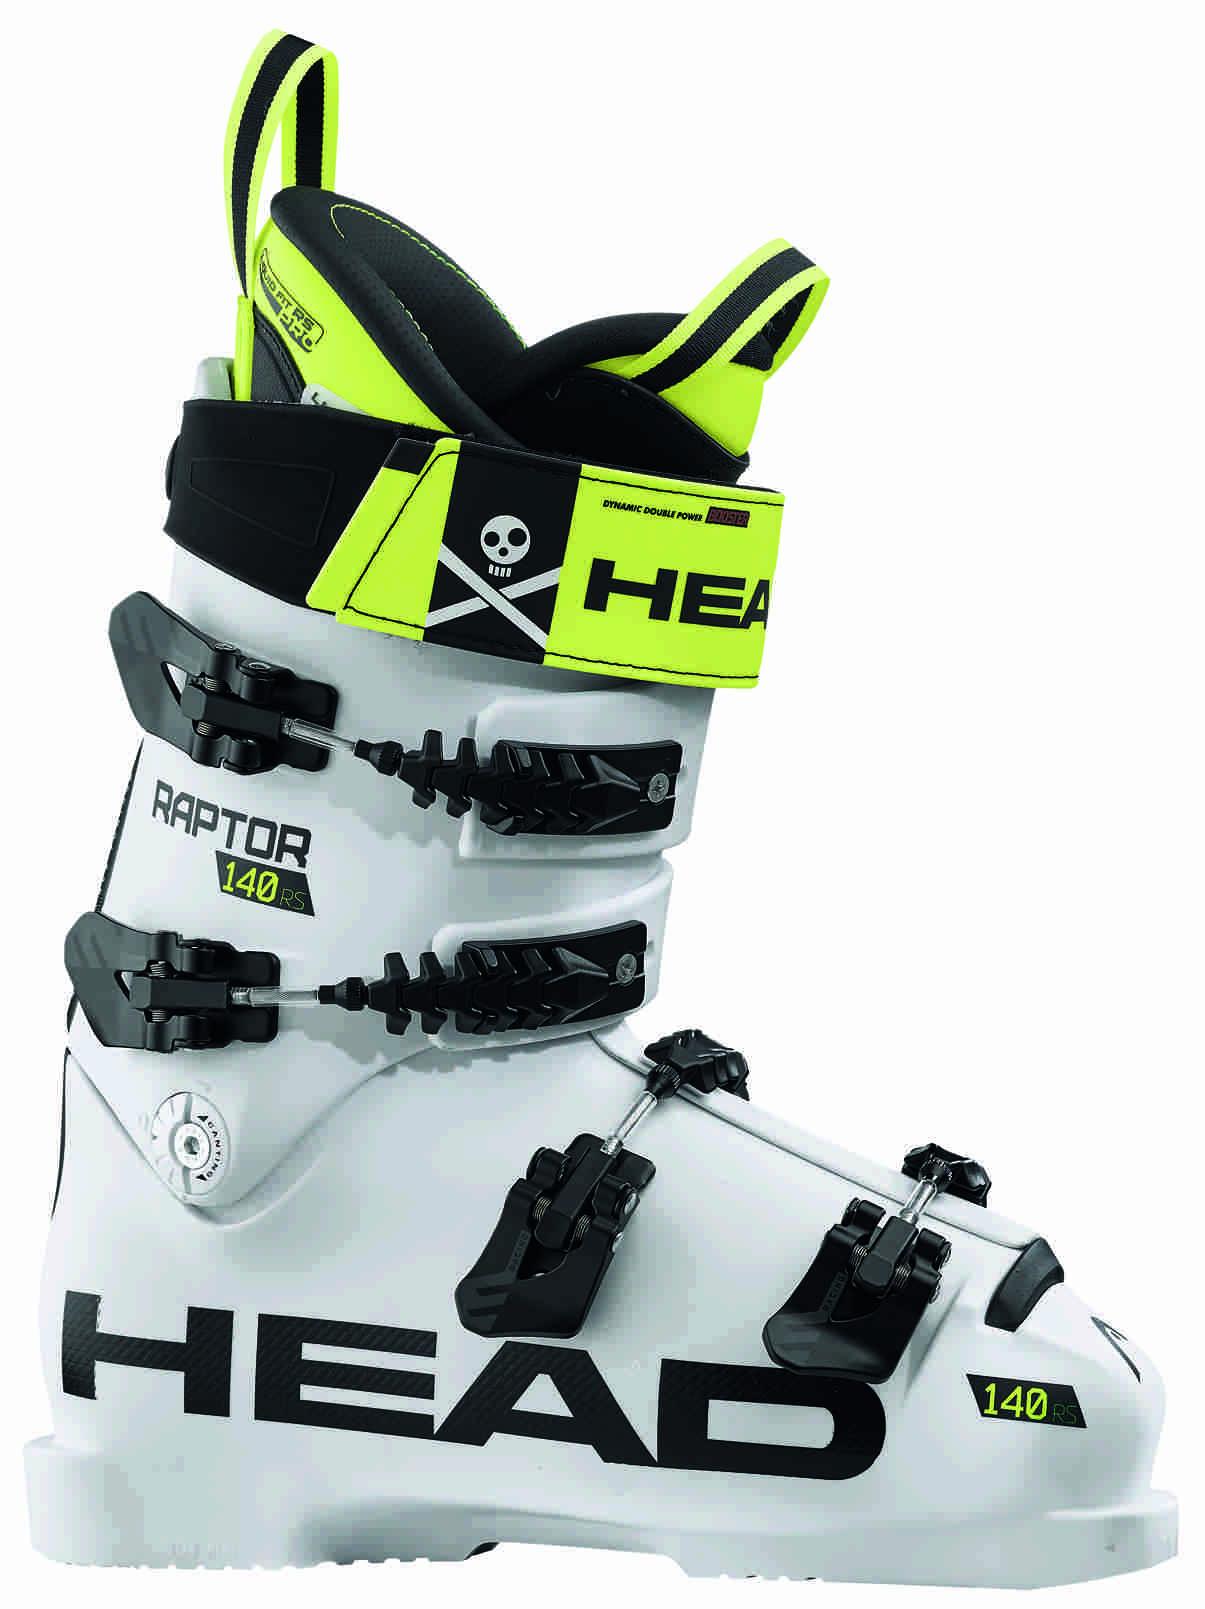 Head Ботинки горнолыжные Head RAPTOR 140S RS, размер 28,5 см sinbo sr 140s